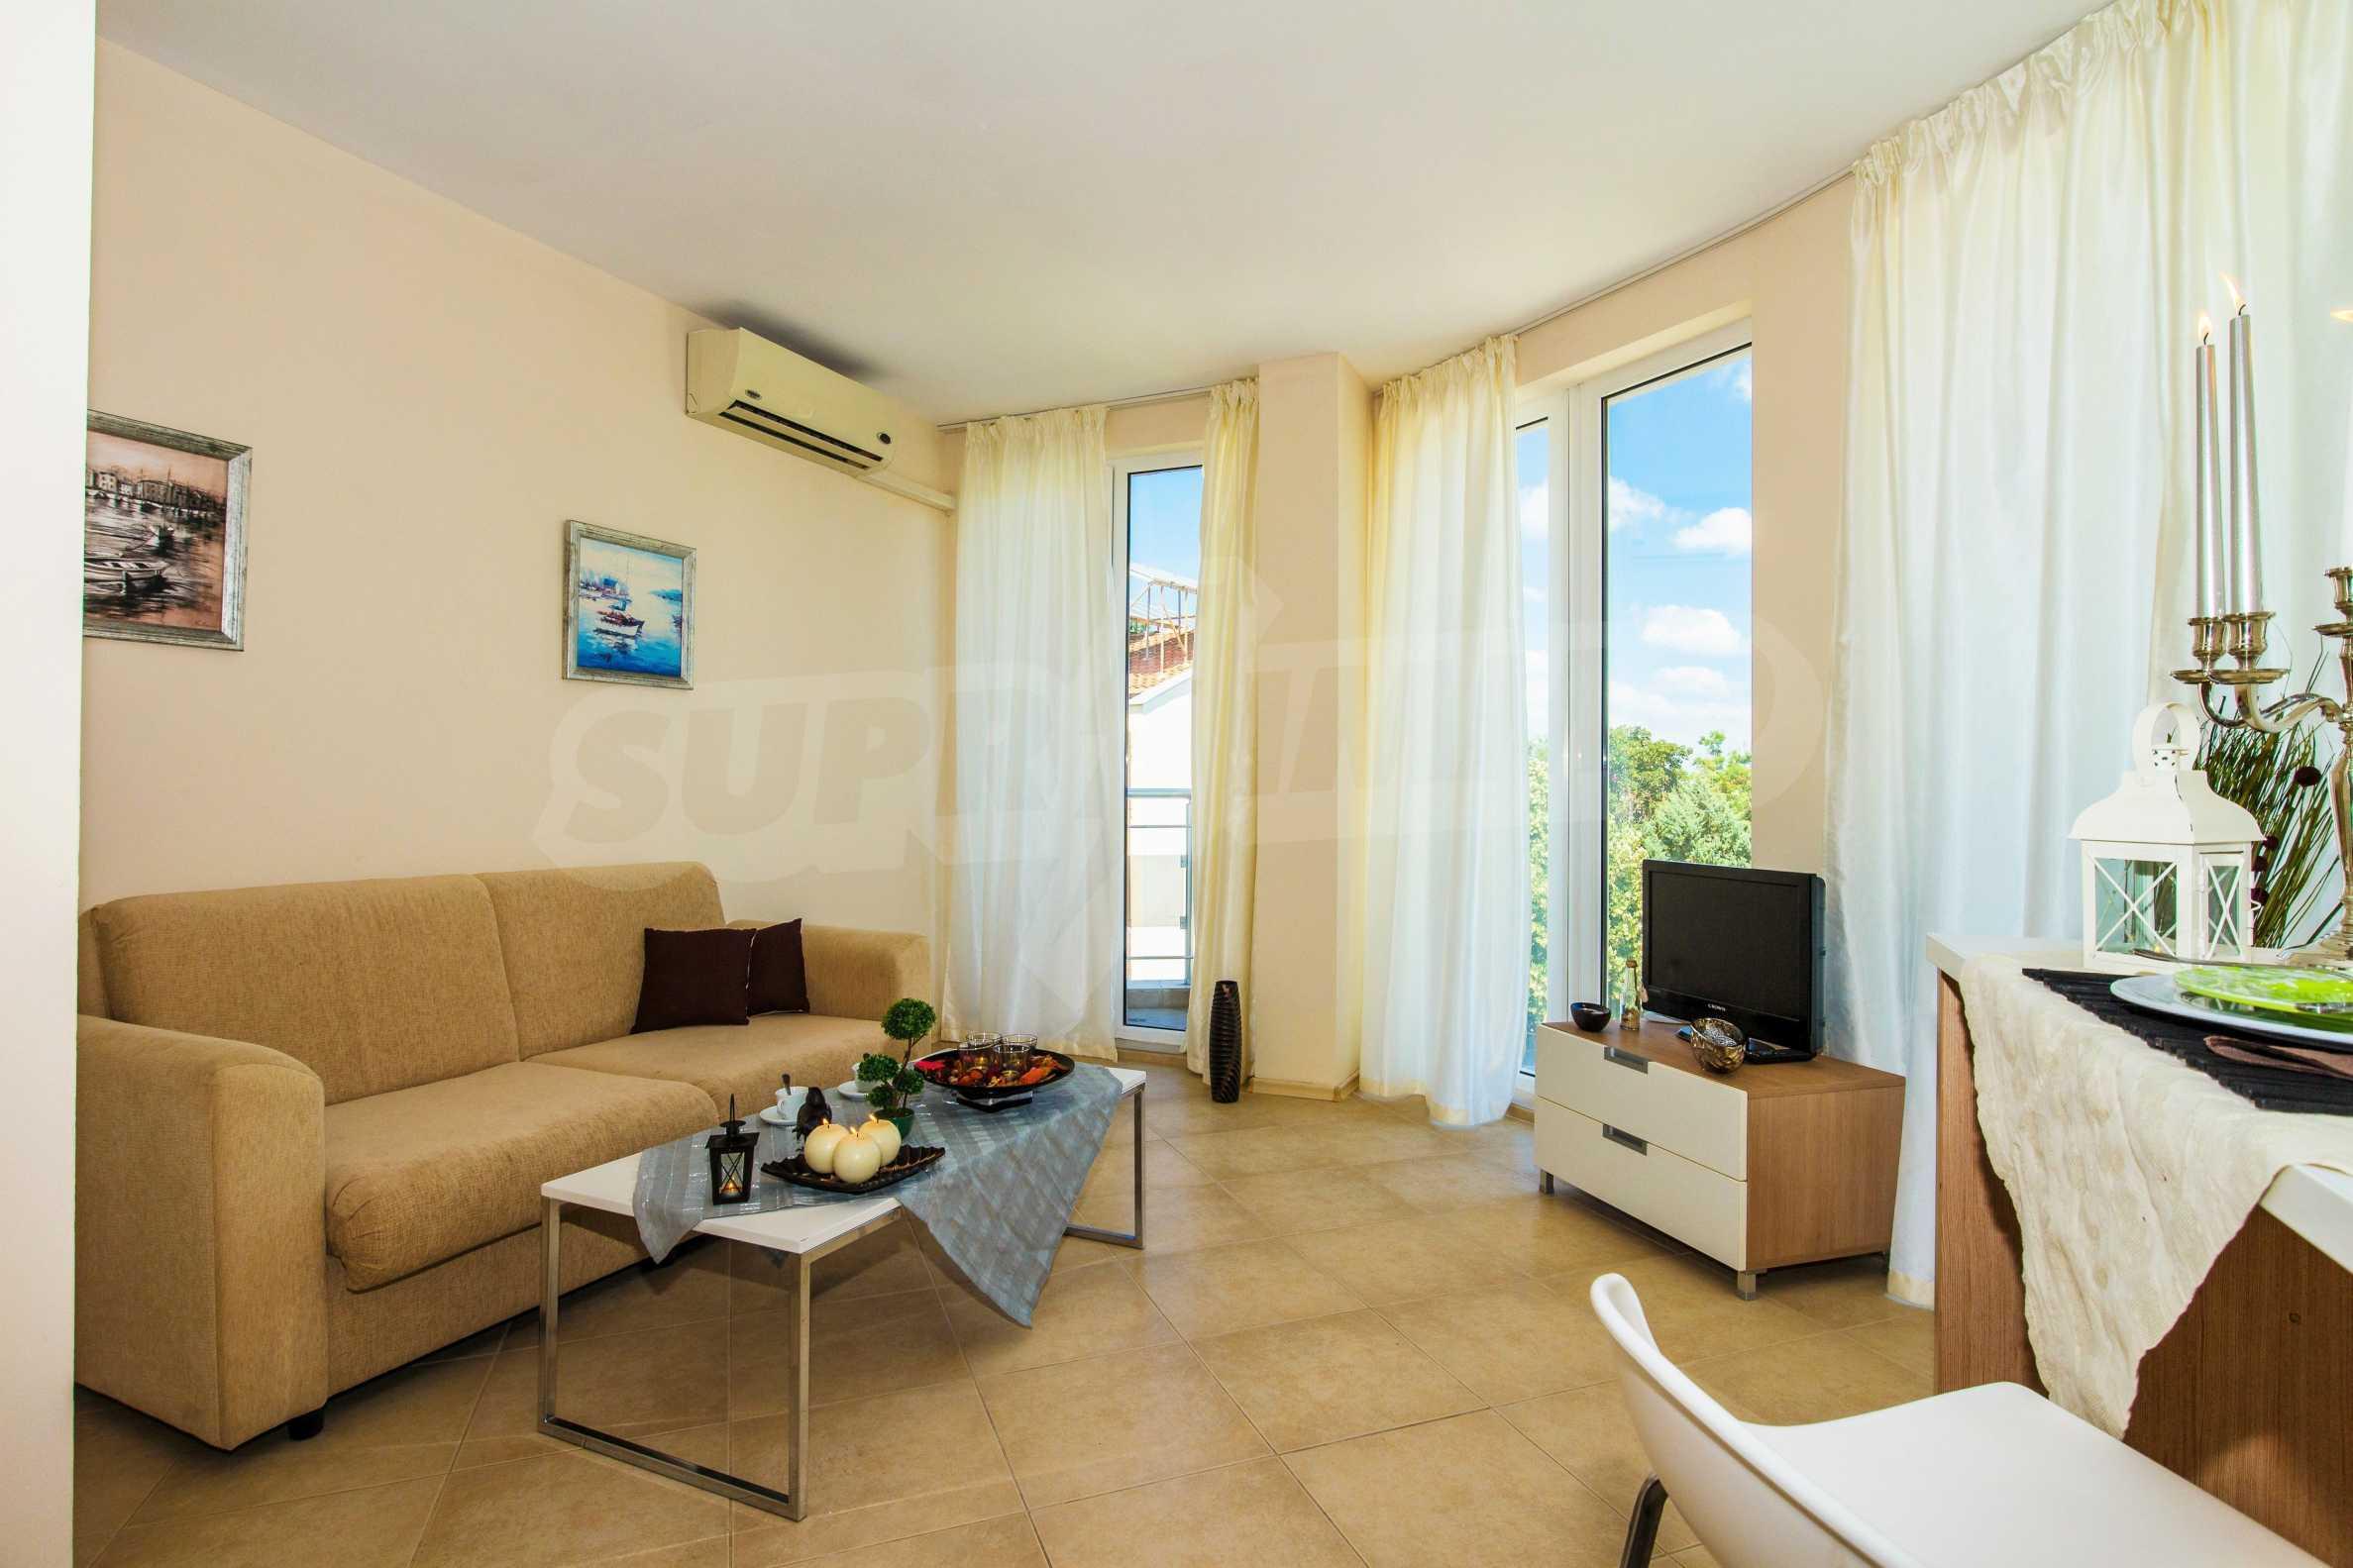 Тристаен апартамент в комплекс Емберли близо до плажа в Лозенец (ап. №423) 6